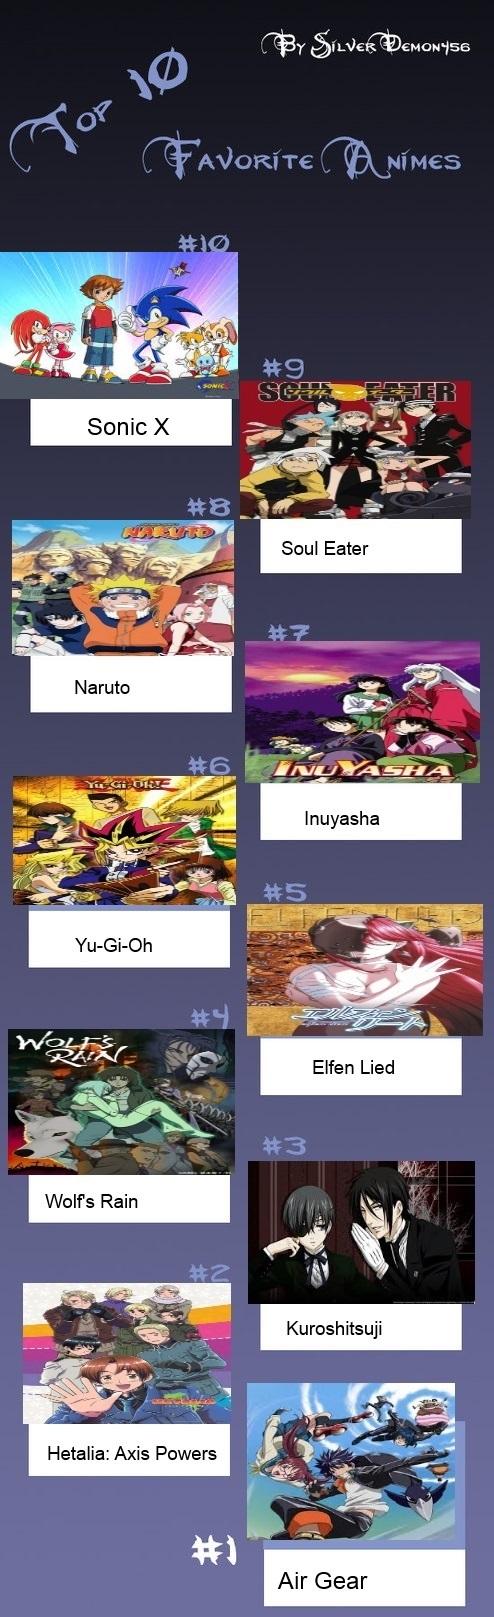 Top Ten Favorite Anime Remake by SmoothCriminalGirl16